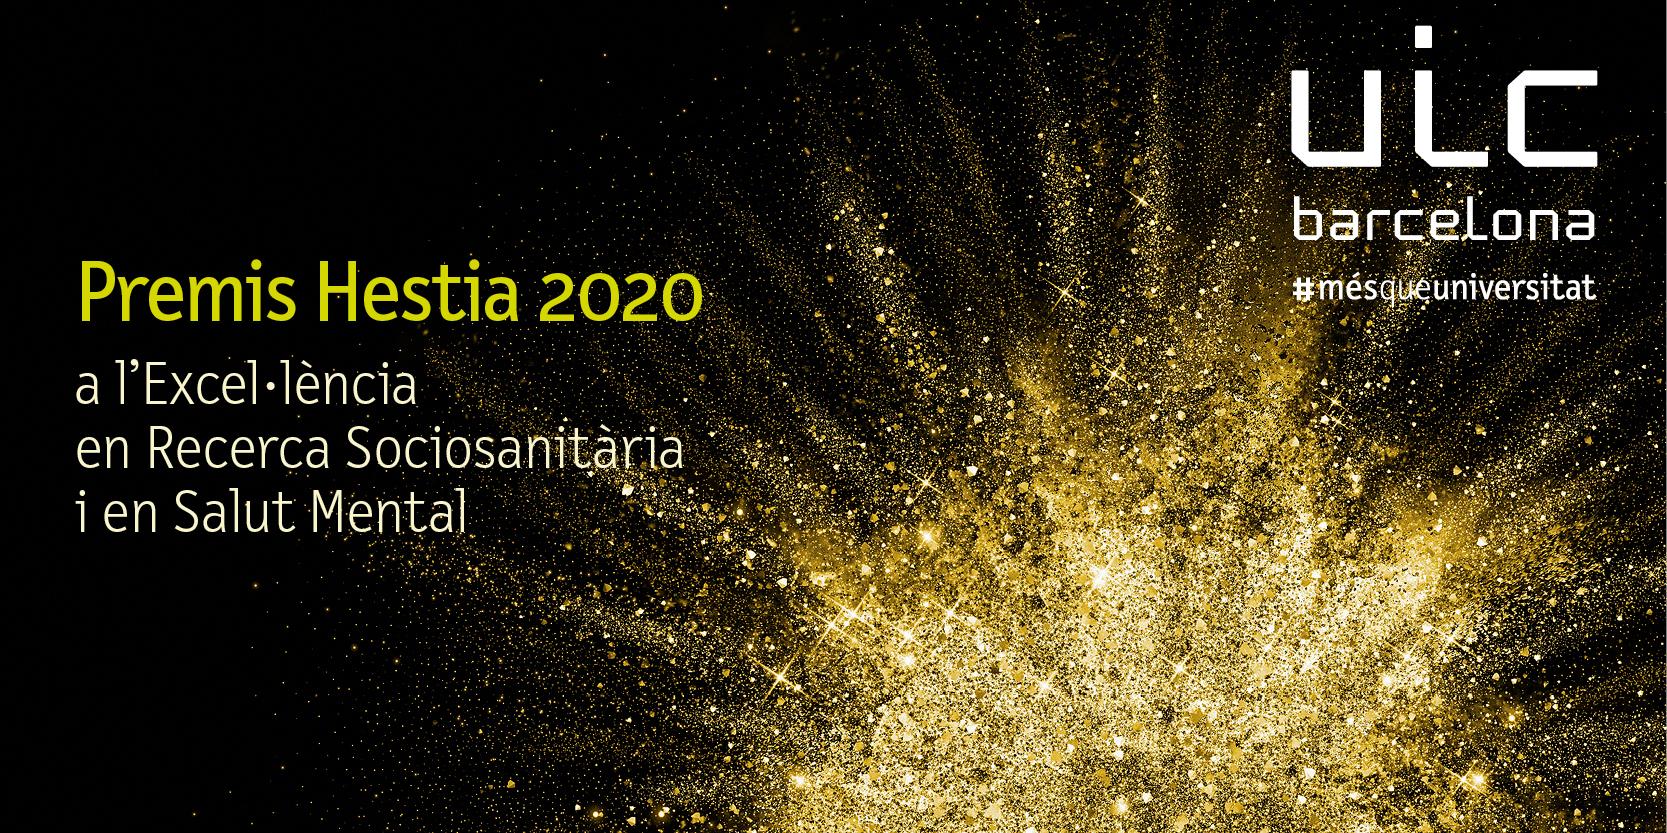 FMCSI HESTIA Premis 2020 Capçalera Mailchimp CAT